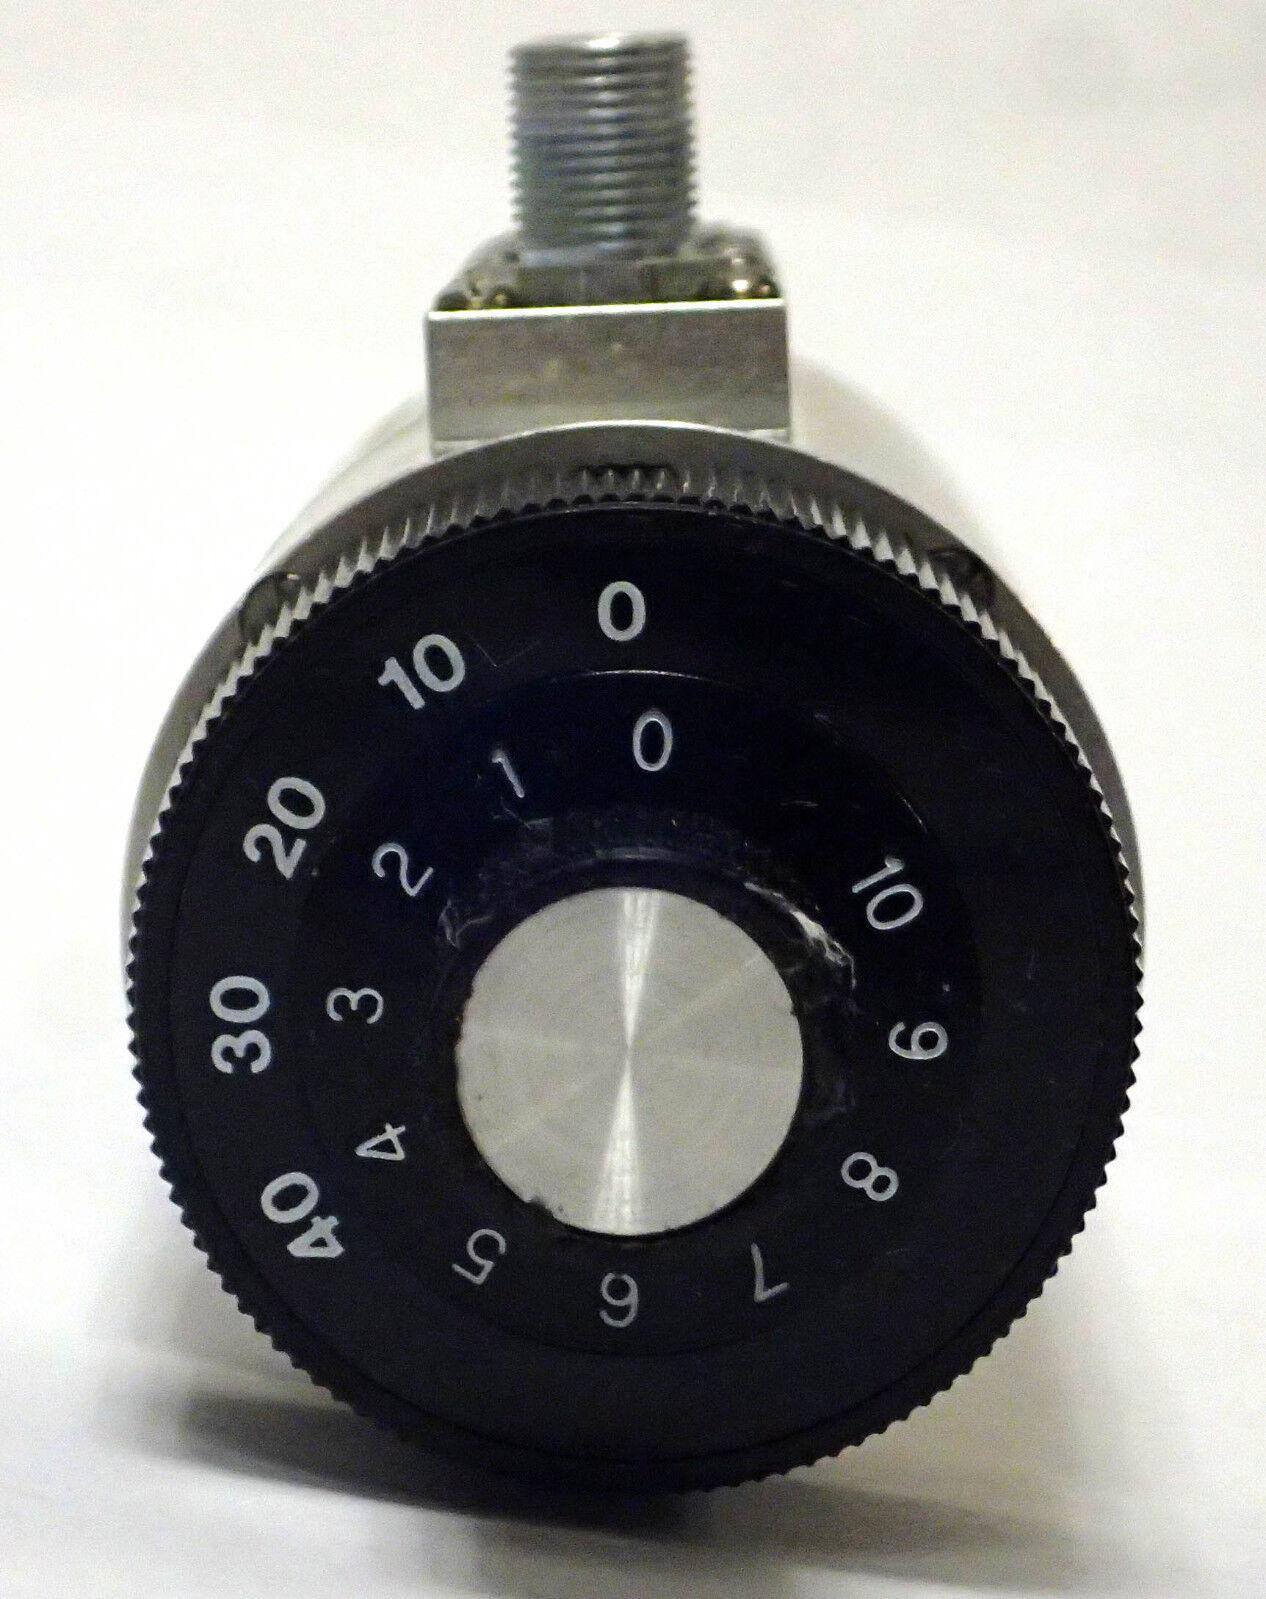 Jfw Ind 75DR-002 Doble Giratorio Atenuador Atenuador Atenuador variable 75OHM 10dB 0-500MHz 1W Tipo F 4c11a8